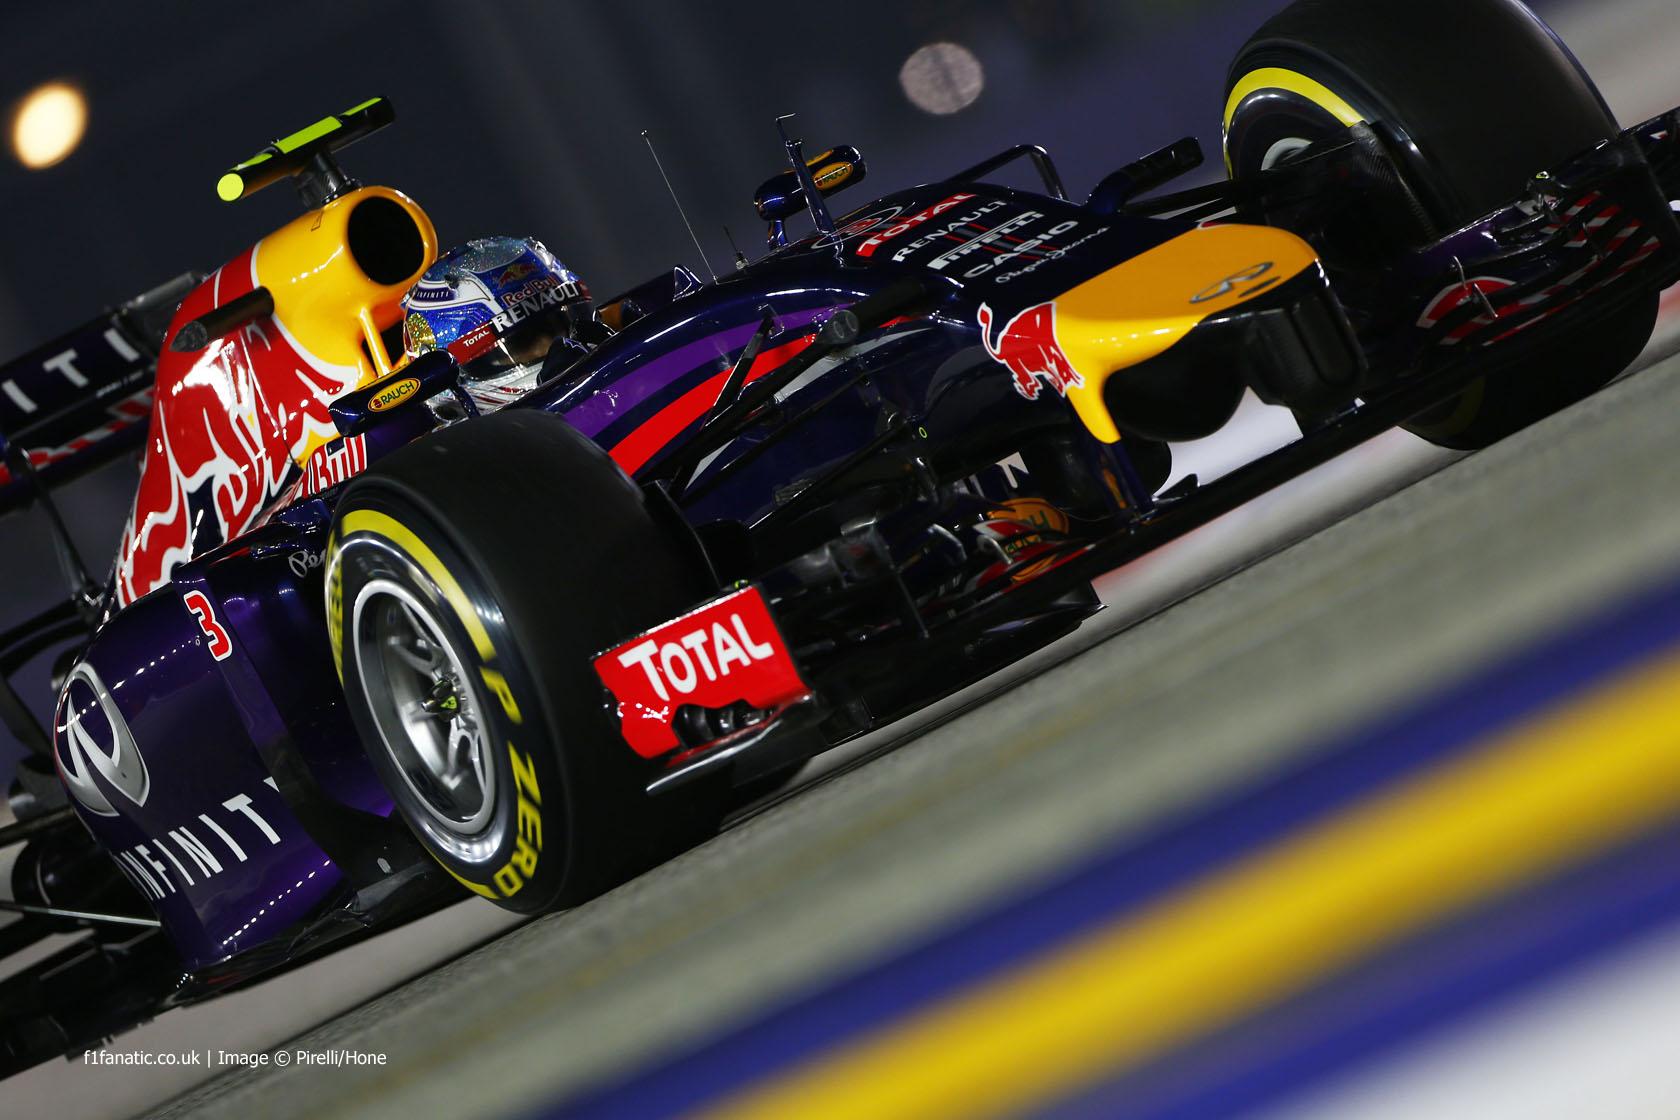 Daniel Ricciardo, Red Bull, Singapore, 2014